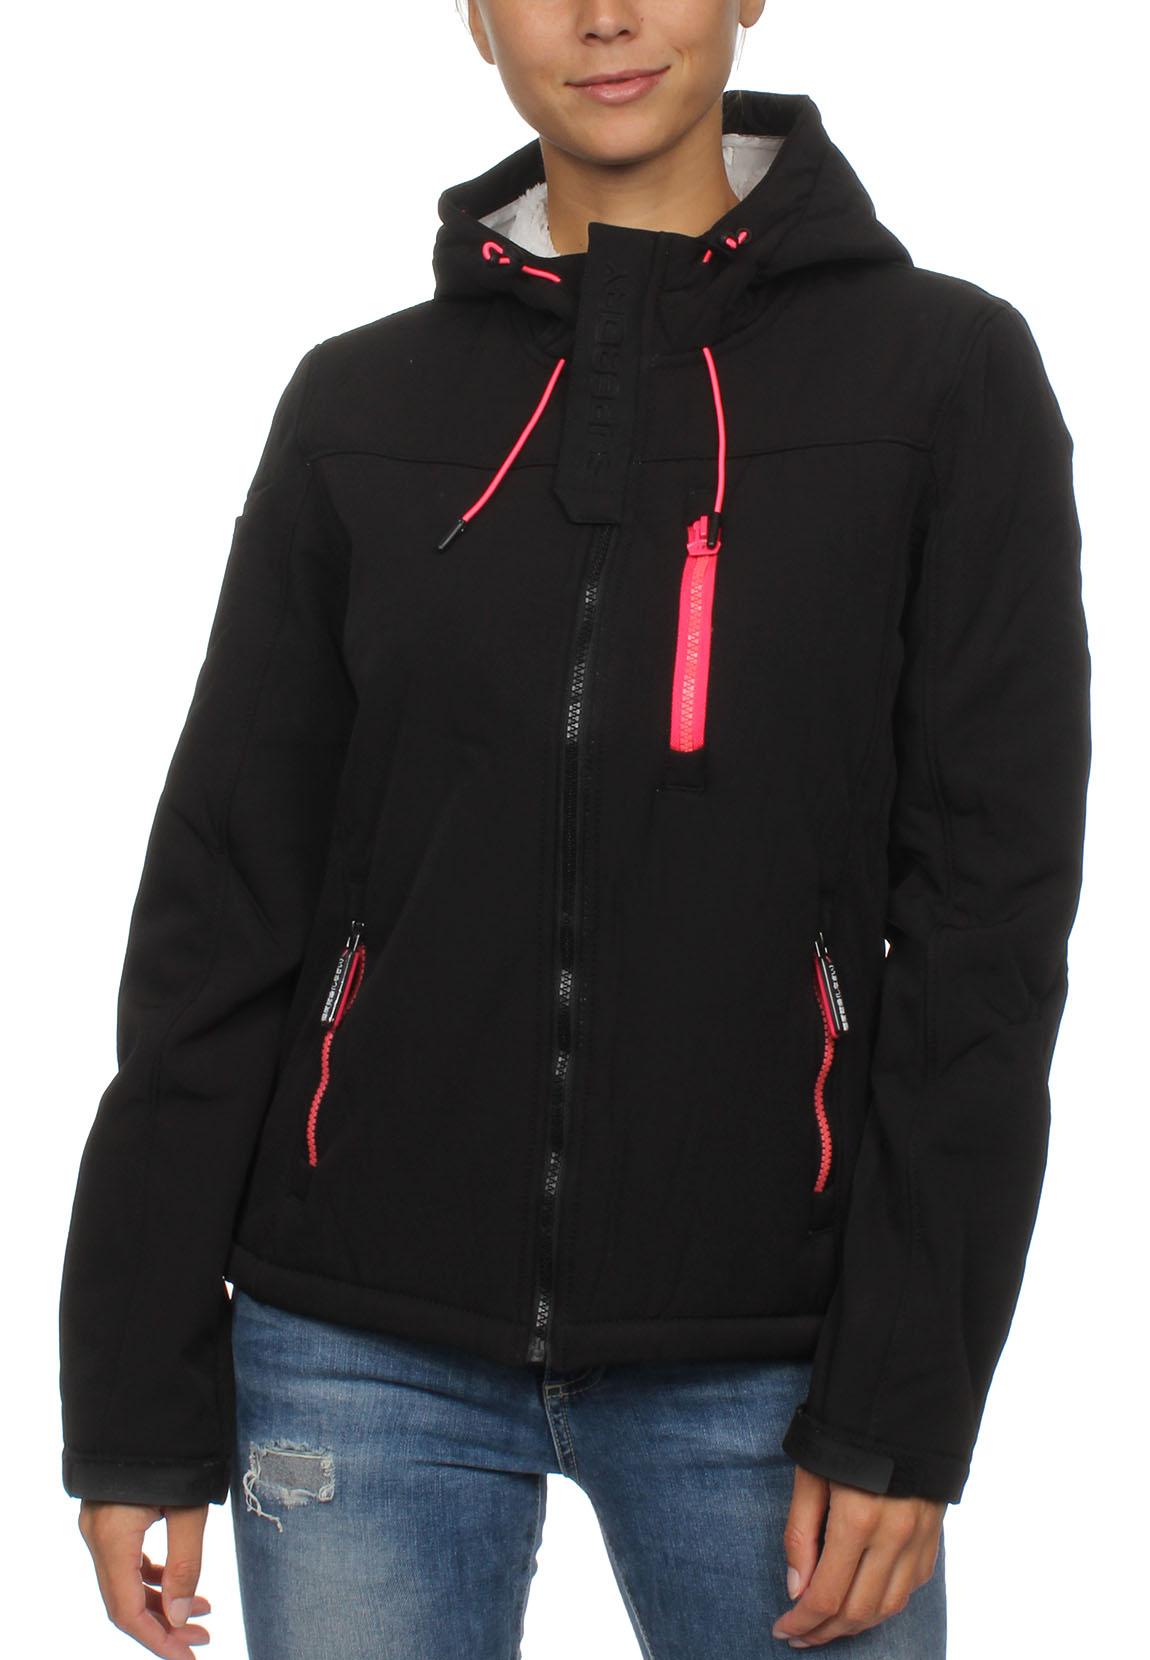 Windtrekker Winter Damen Hooded Fluro Superdry Jacke Black UqSVLzMpG